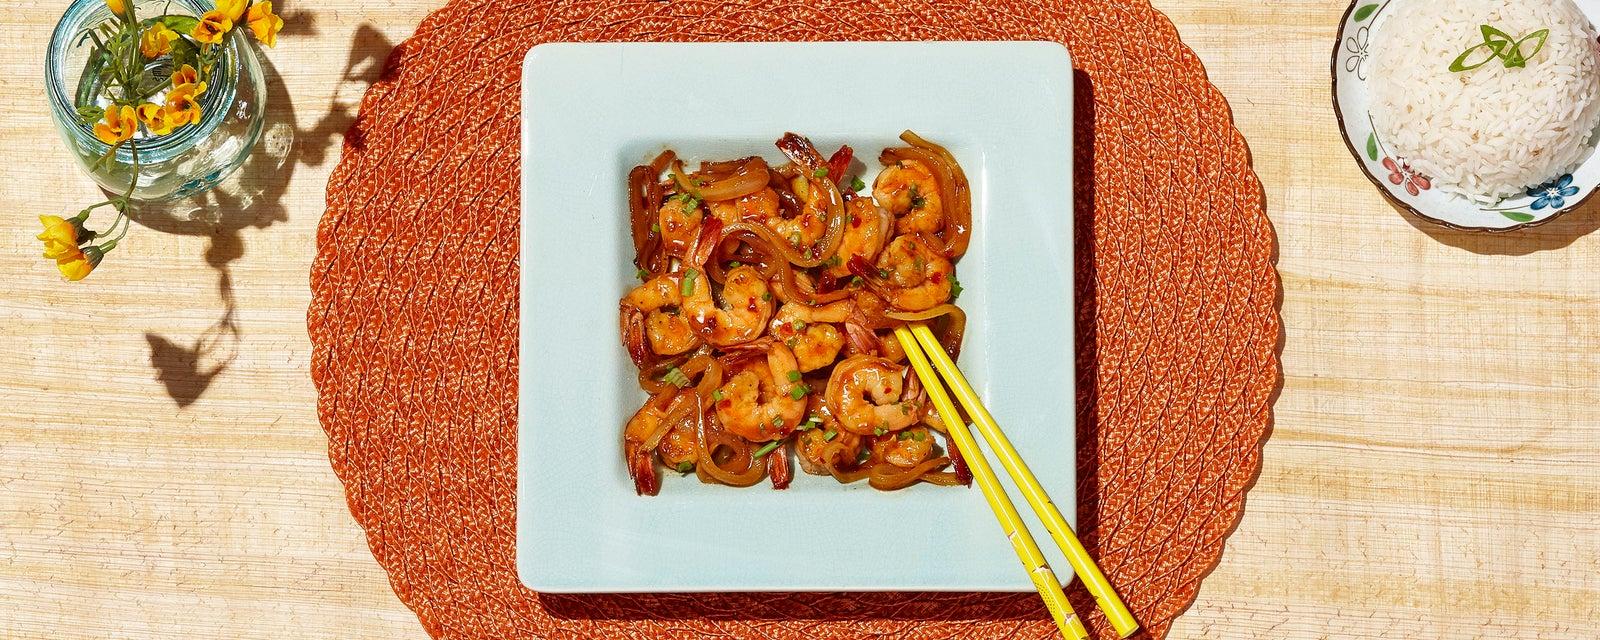 Spicy 'N Sweet Chili Heat Simple Shrimp